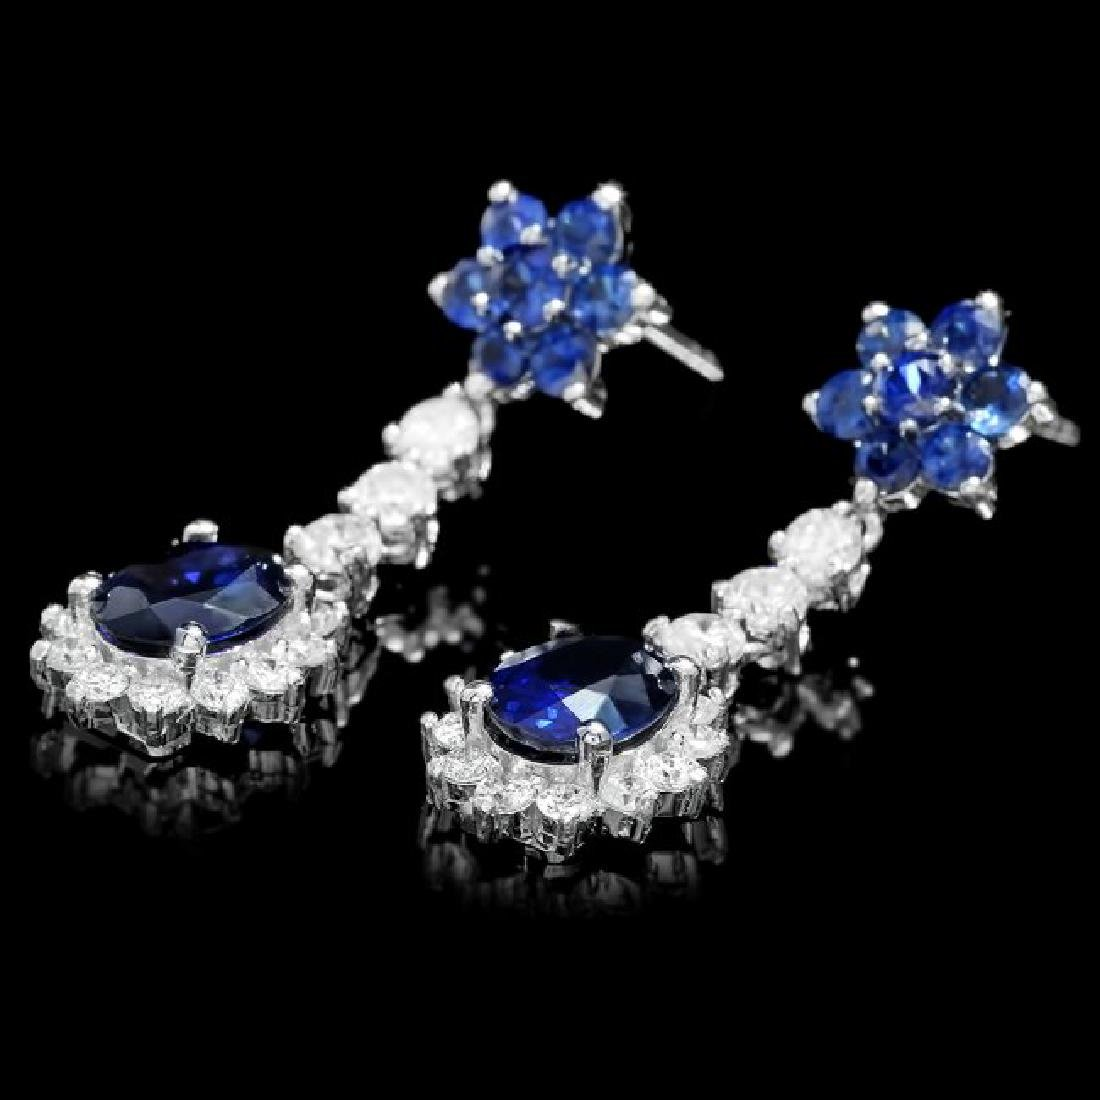 14k Gold 4.5ct Sapphire 1.40ct Diamond Earrings - 3